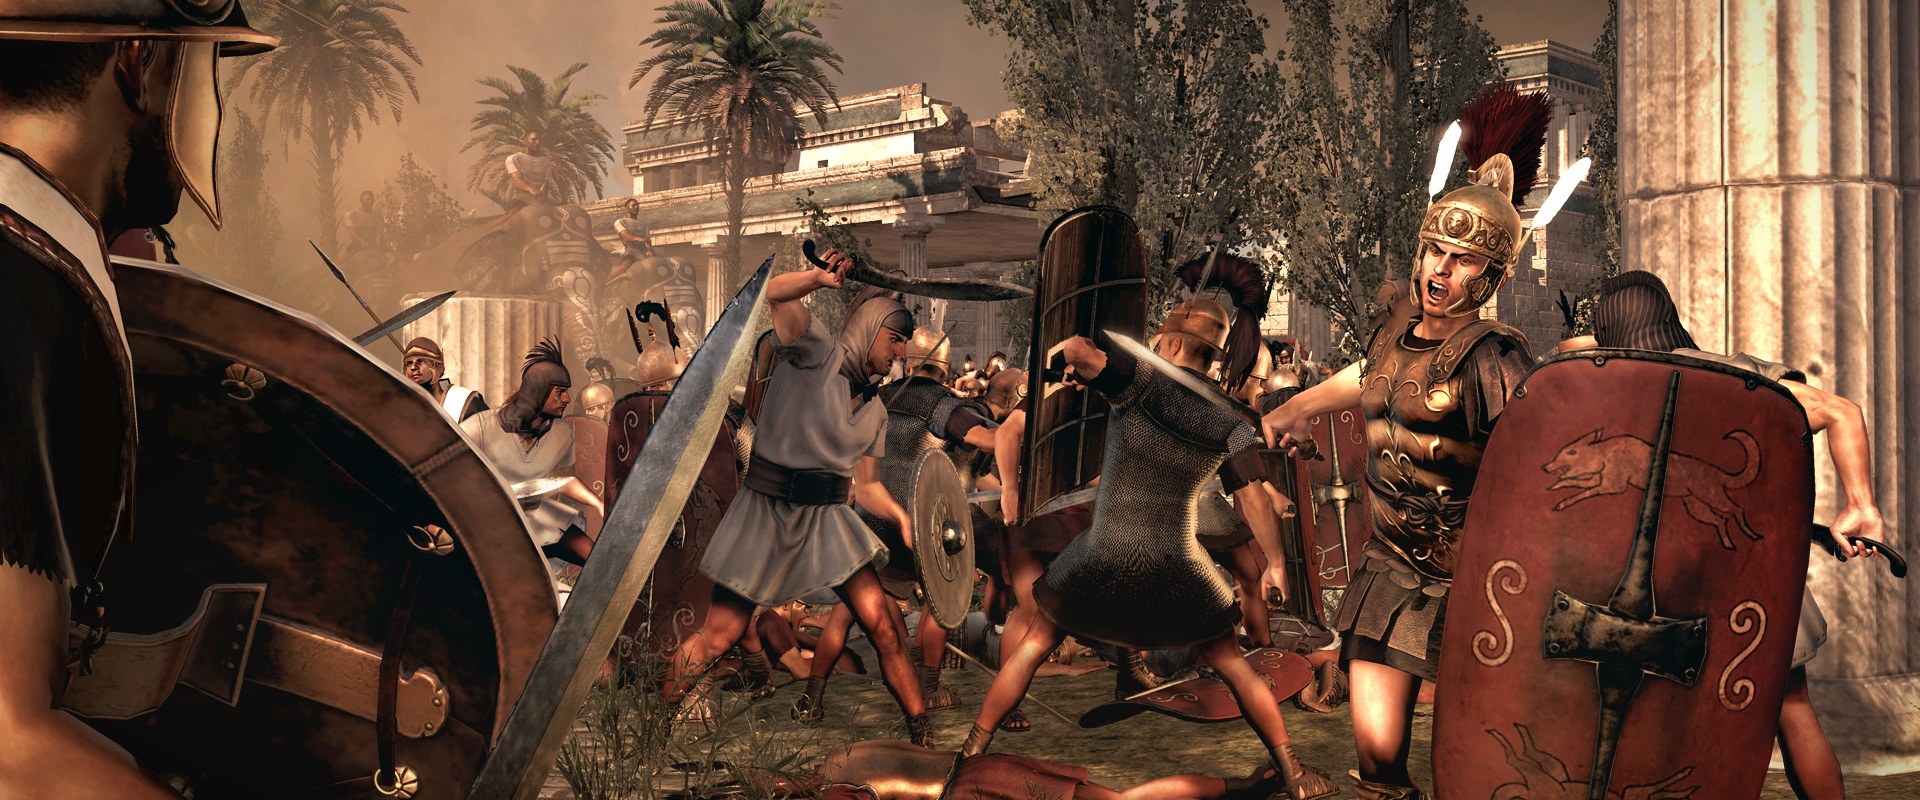 OBR.: Total War: Rome II- boj zblízka